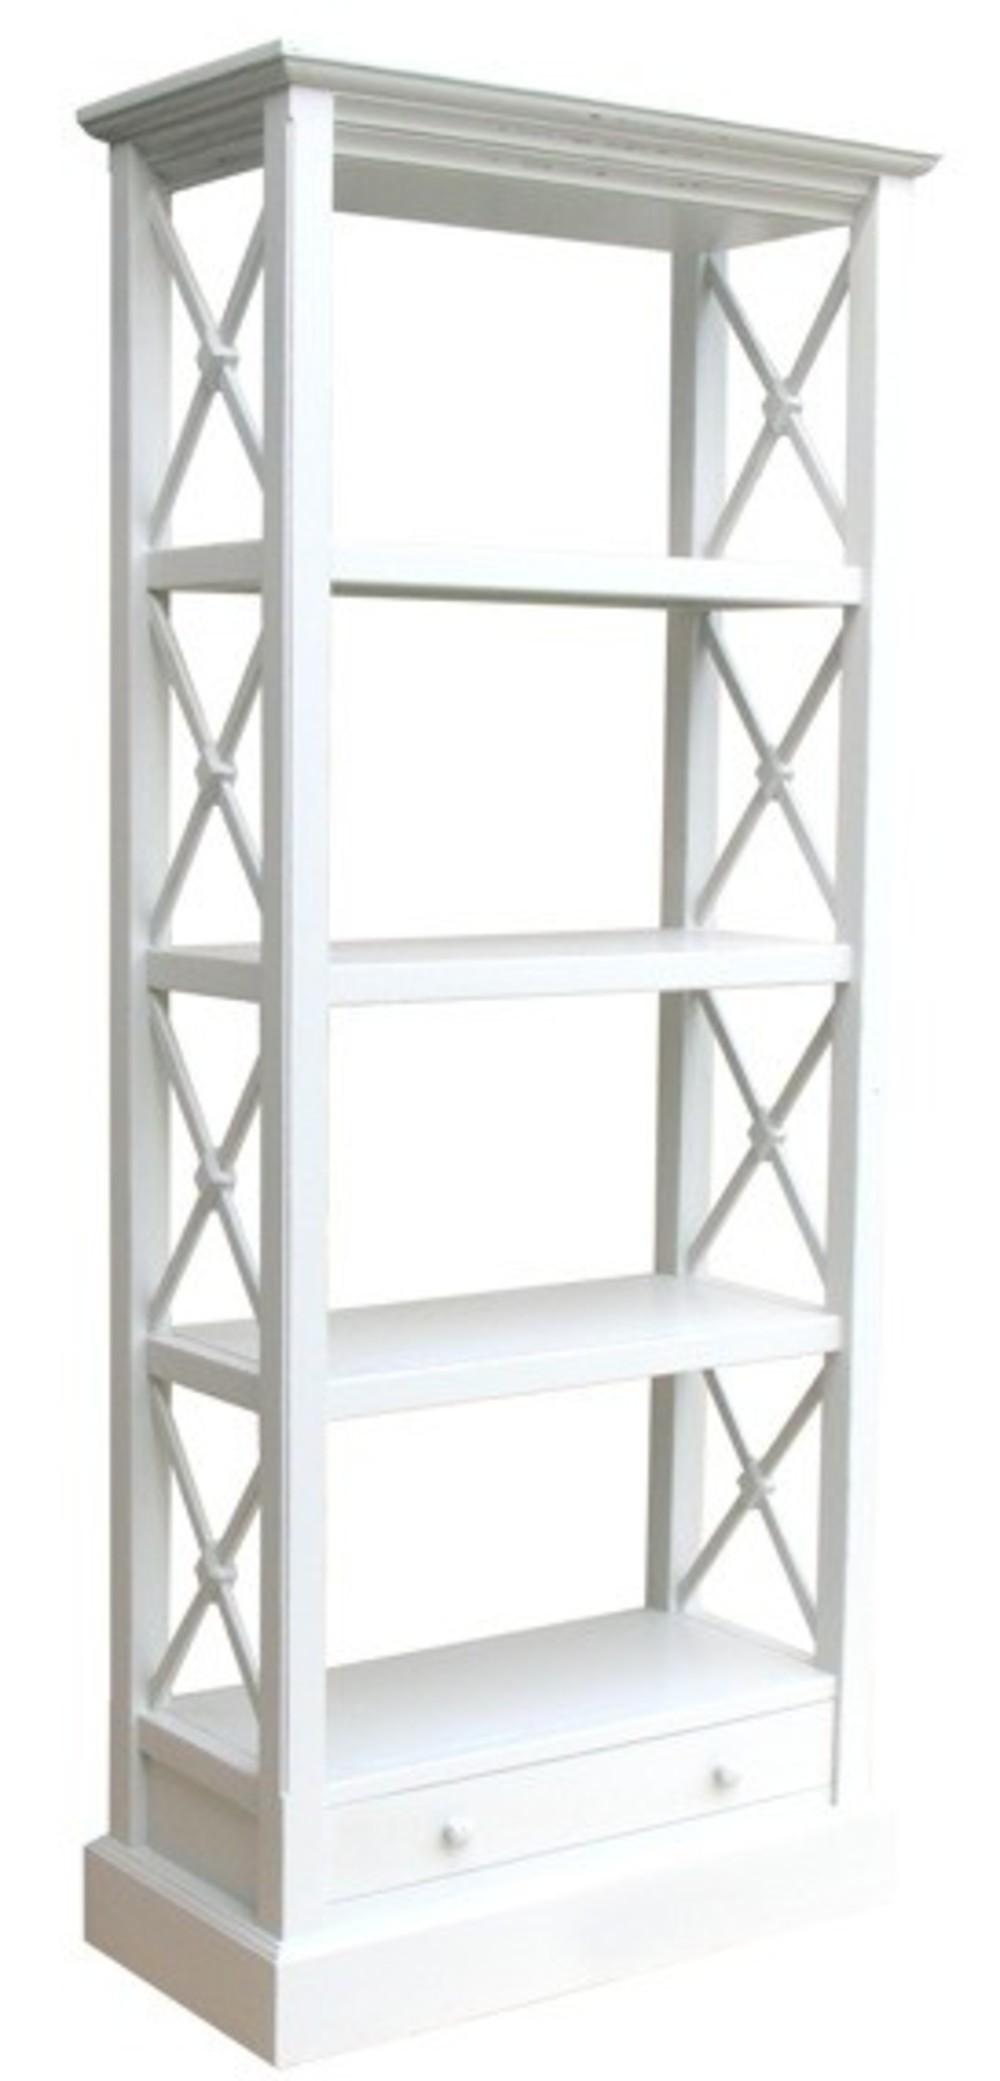 Trade Winds Furniture - Cross Bar Bookshelf